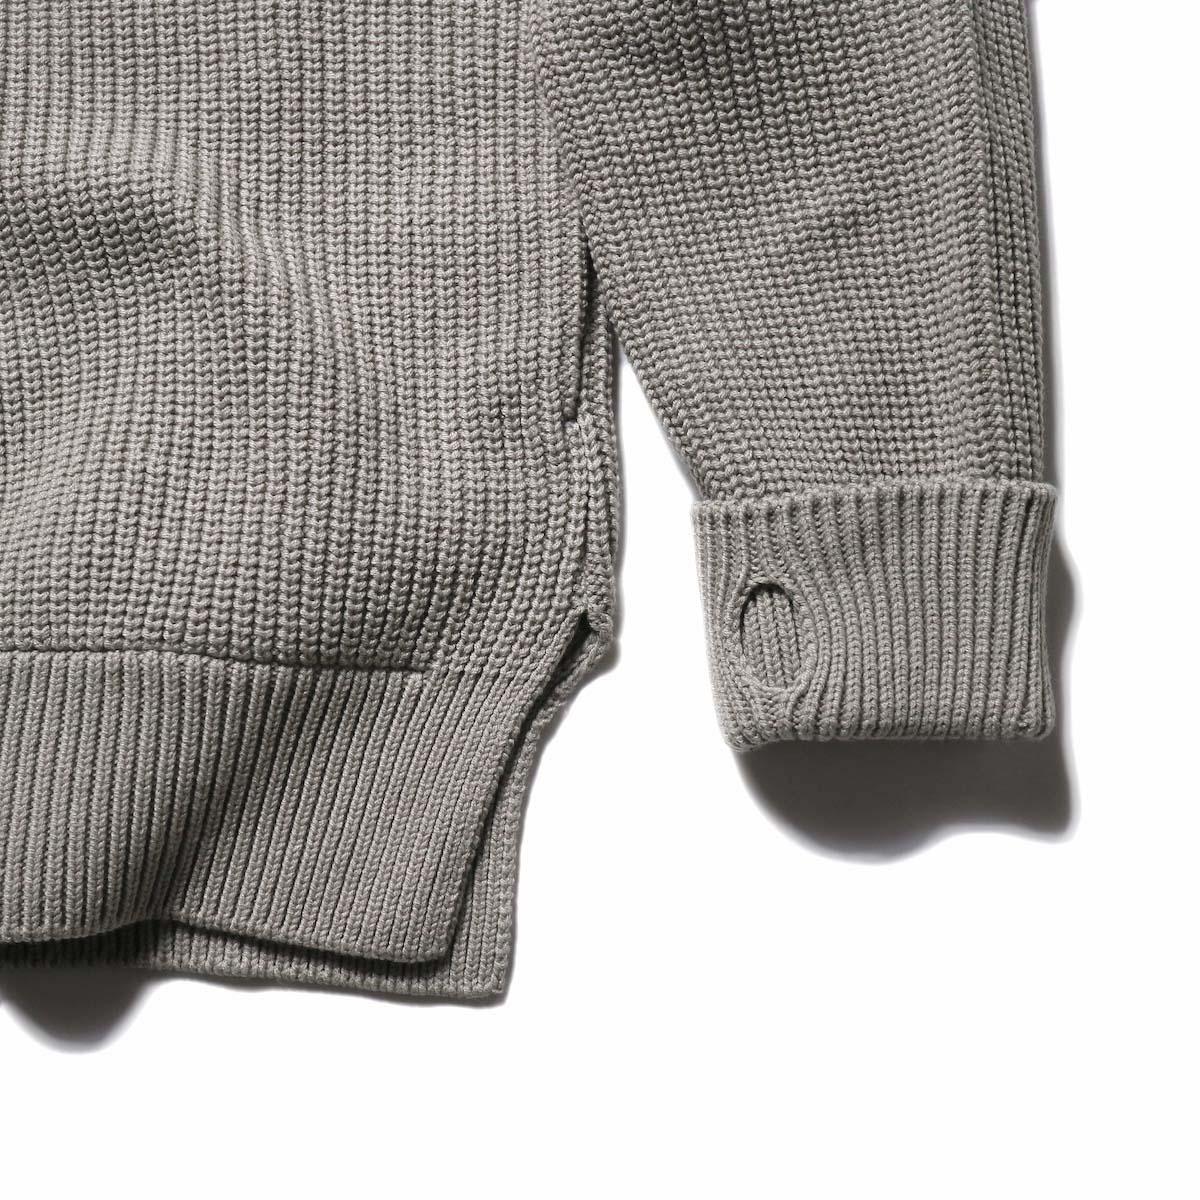 CURLY / AZTEC CN SWEATER (DarkBeige)袖、襟